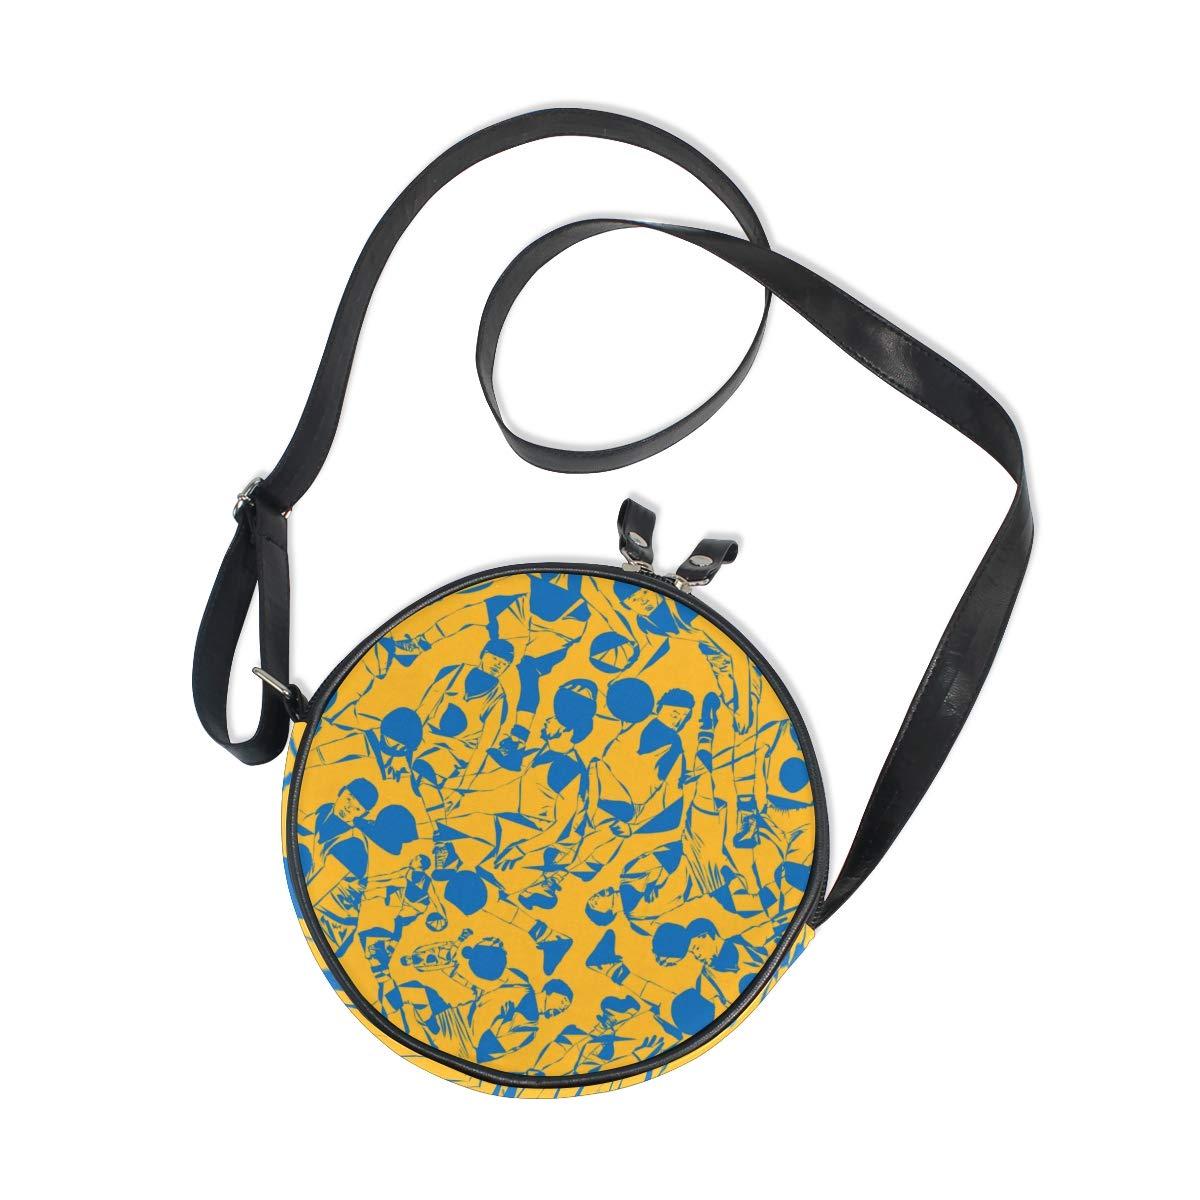 KEAKIA LORVIES Playing Basketball Pattern Round Crossbody Bag Shoulder Sling Bag Handbag Purse Satchel Shoulder Bag for Kids Women